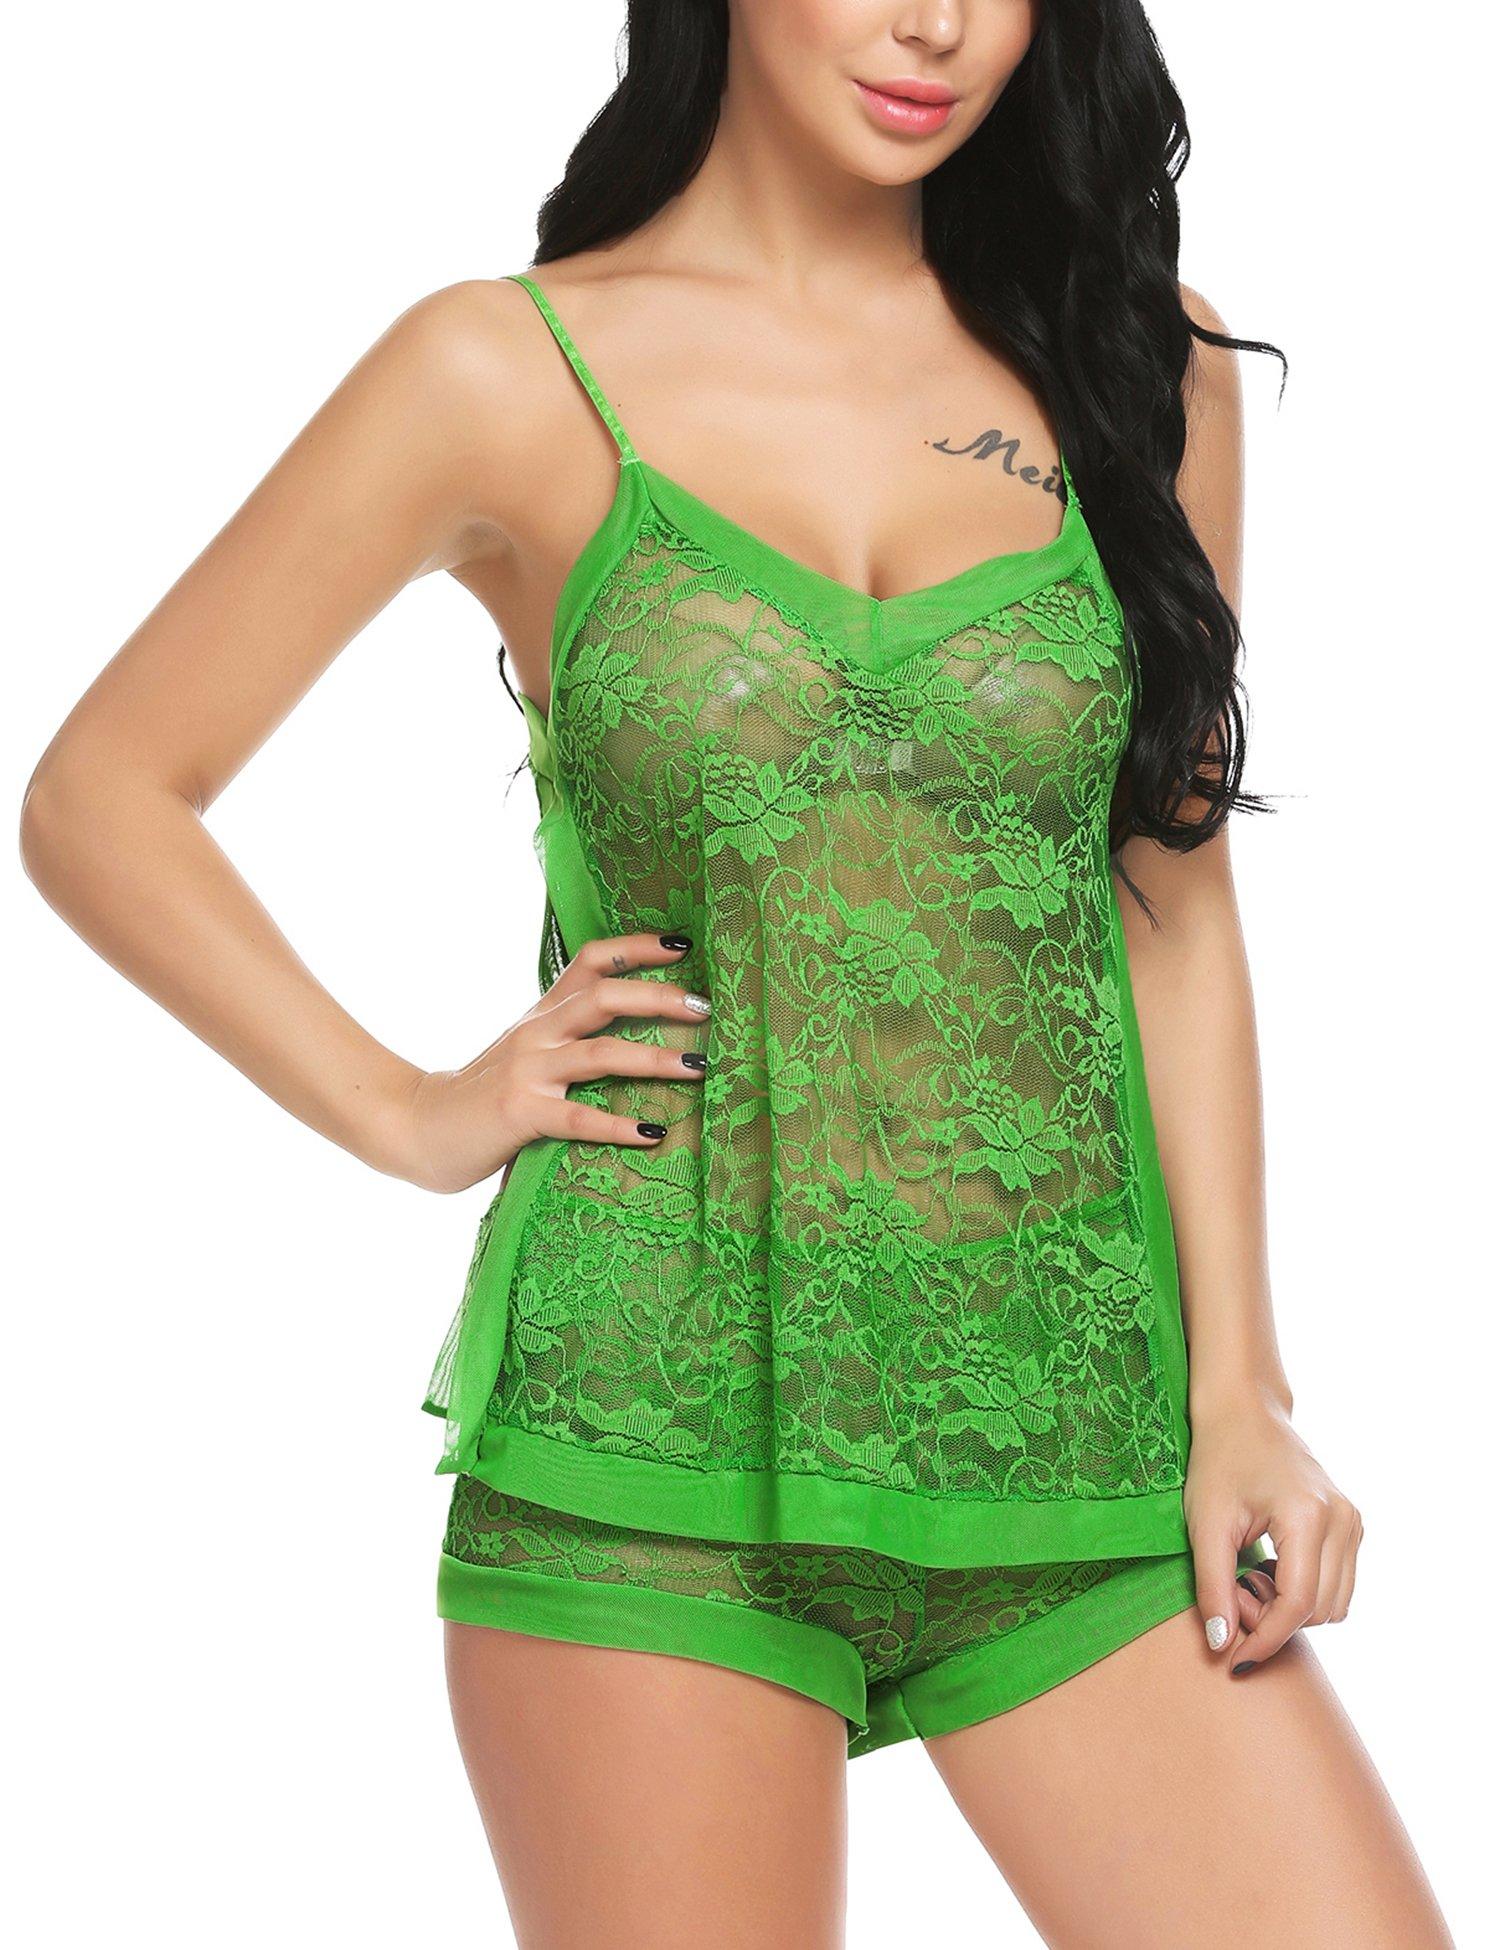 Avidlove Women Teddy Sexy Lingerie Outfit Pajam Short Set,Green,Medium